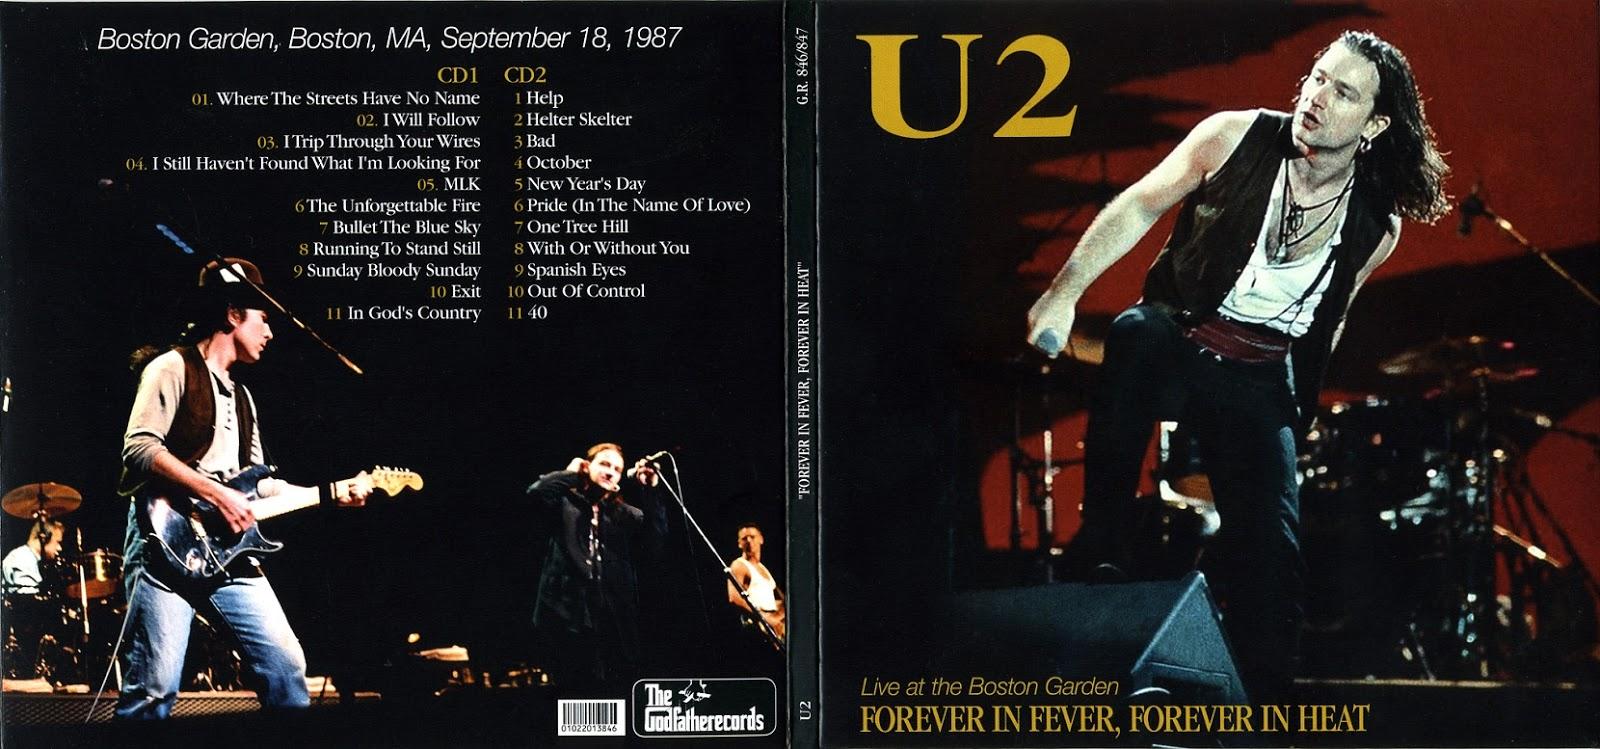 U2 boston live dvd - Kaze no stigma episode guide season 2